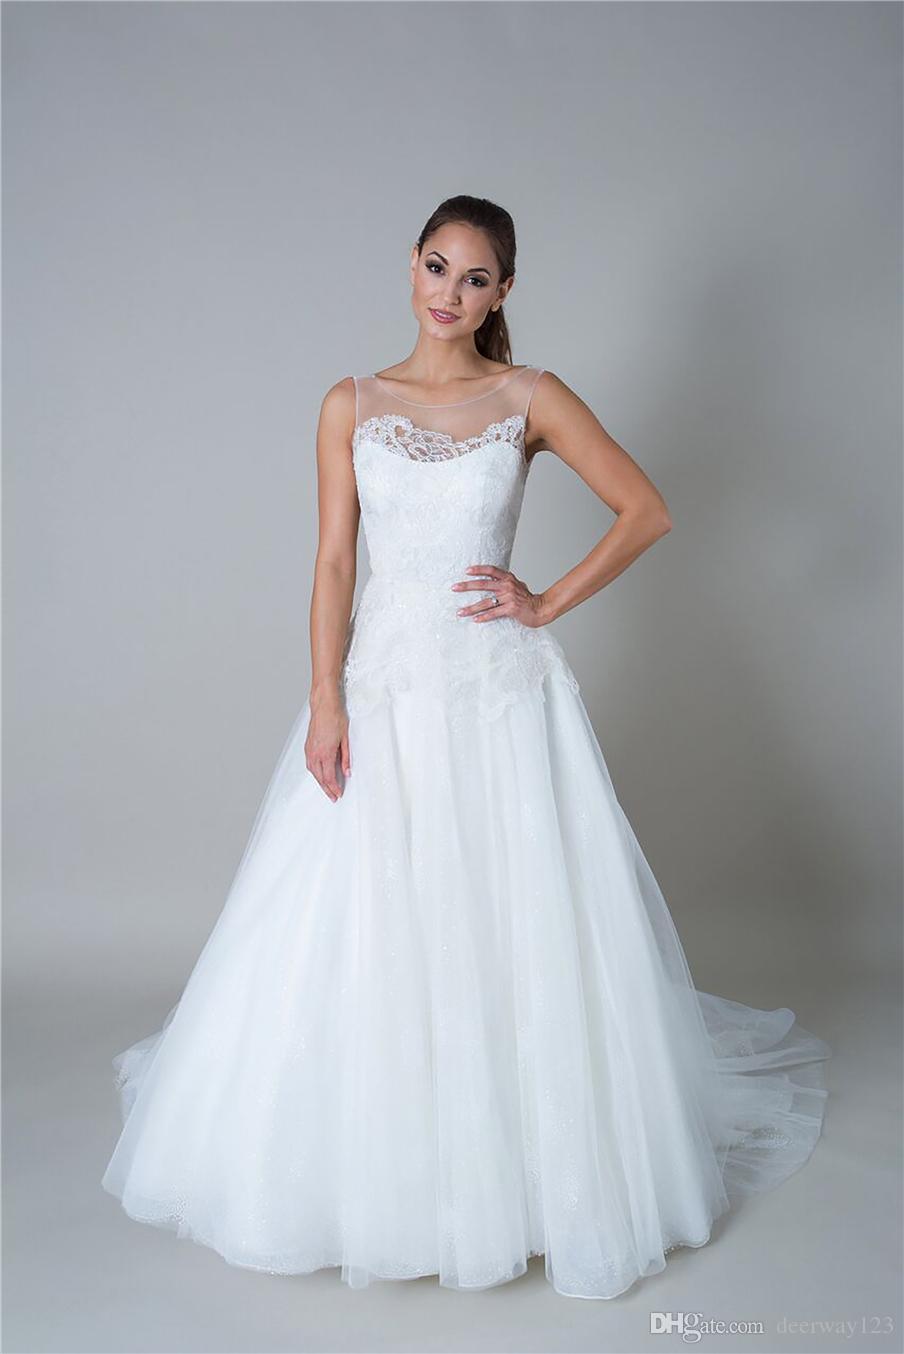 Ilusión Barco Cuello blusa e ilusión baja, v- Volver tirantes Capas sobre capas de tul blanco vestido de novia Vestidos de novia